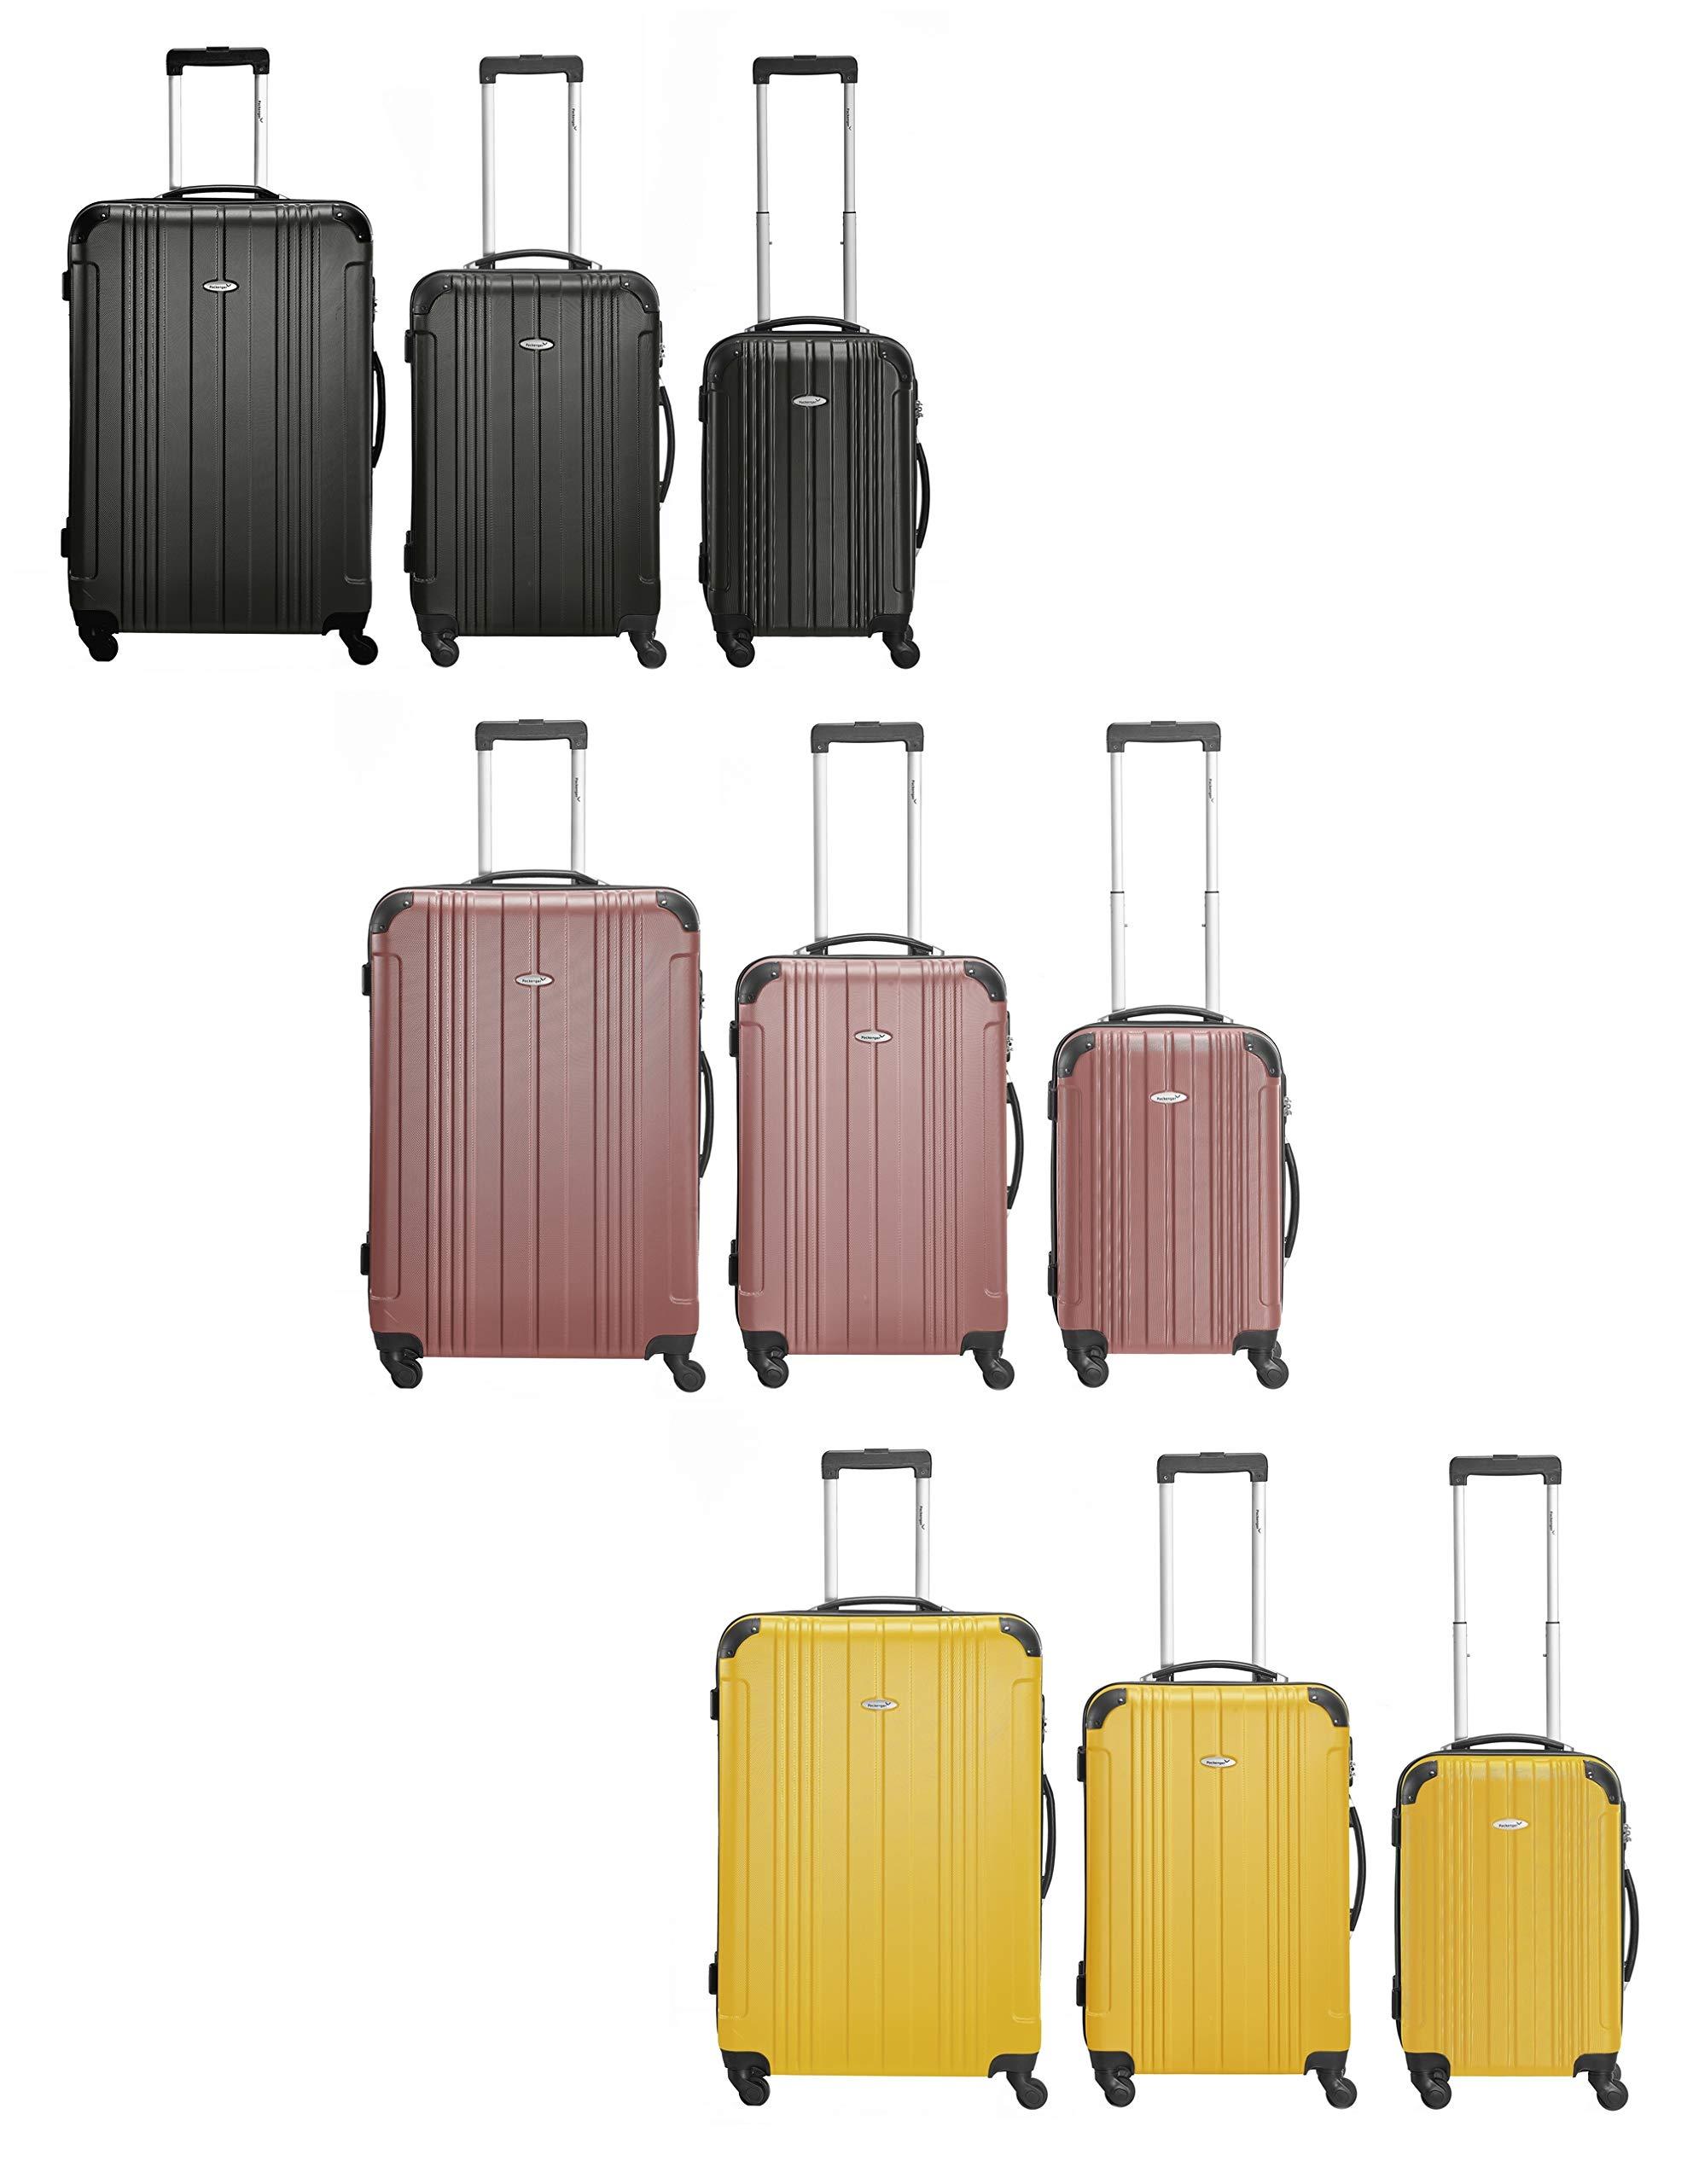 Packenger-Kofferset-Goliath-3-teilig-M-L-XL-4-Rollen-Koffer-mit-Zahlenschloss-Hartschalenkoffer-ABS-Robuster-Trolley-Reisekoffer